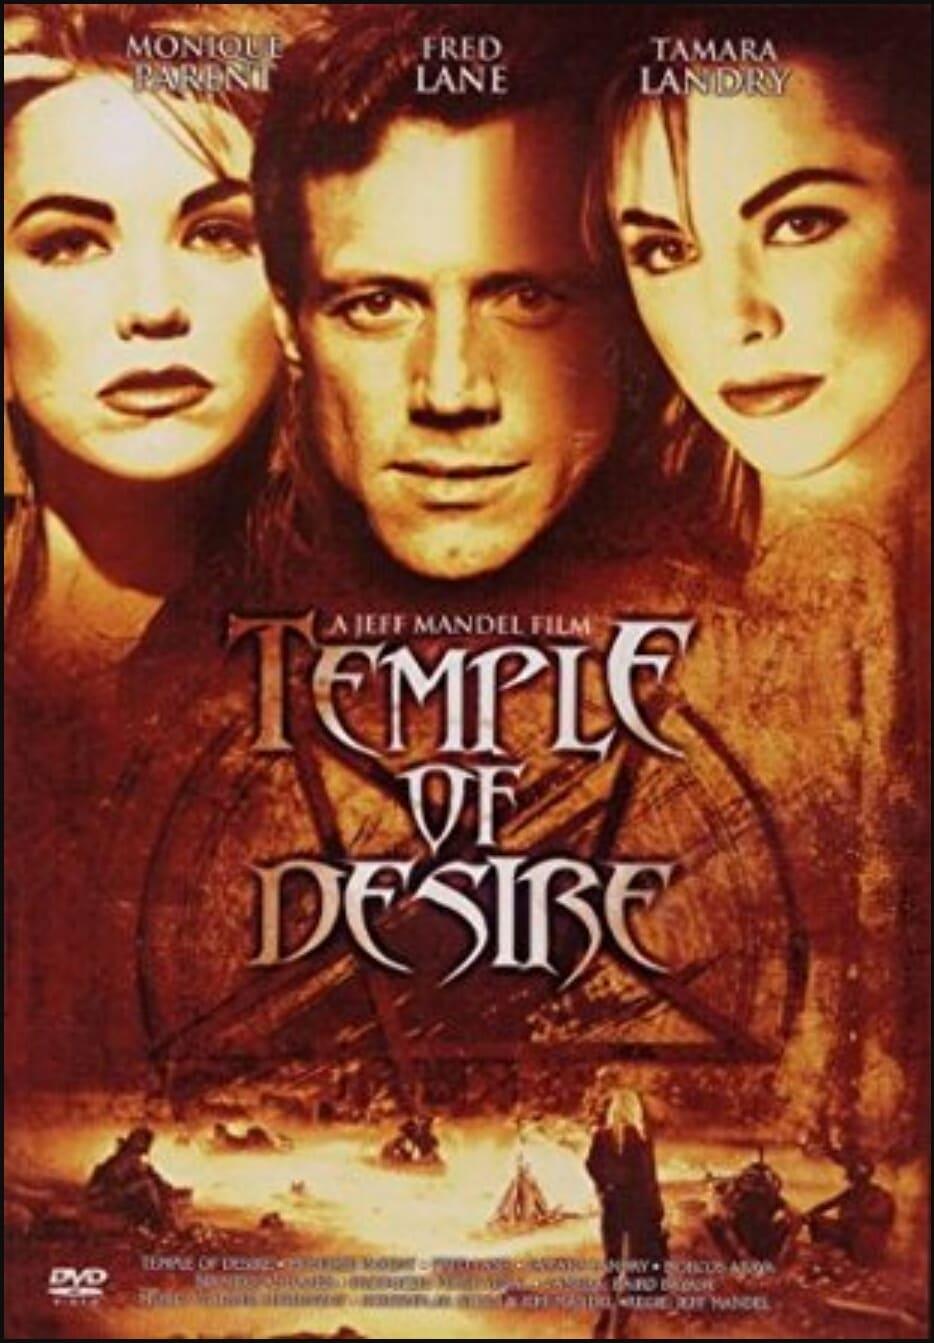 Temple of Desire